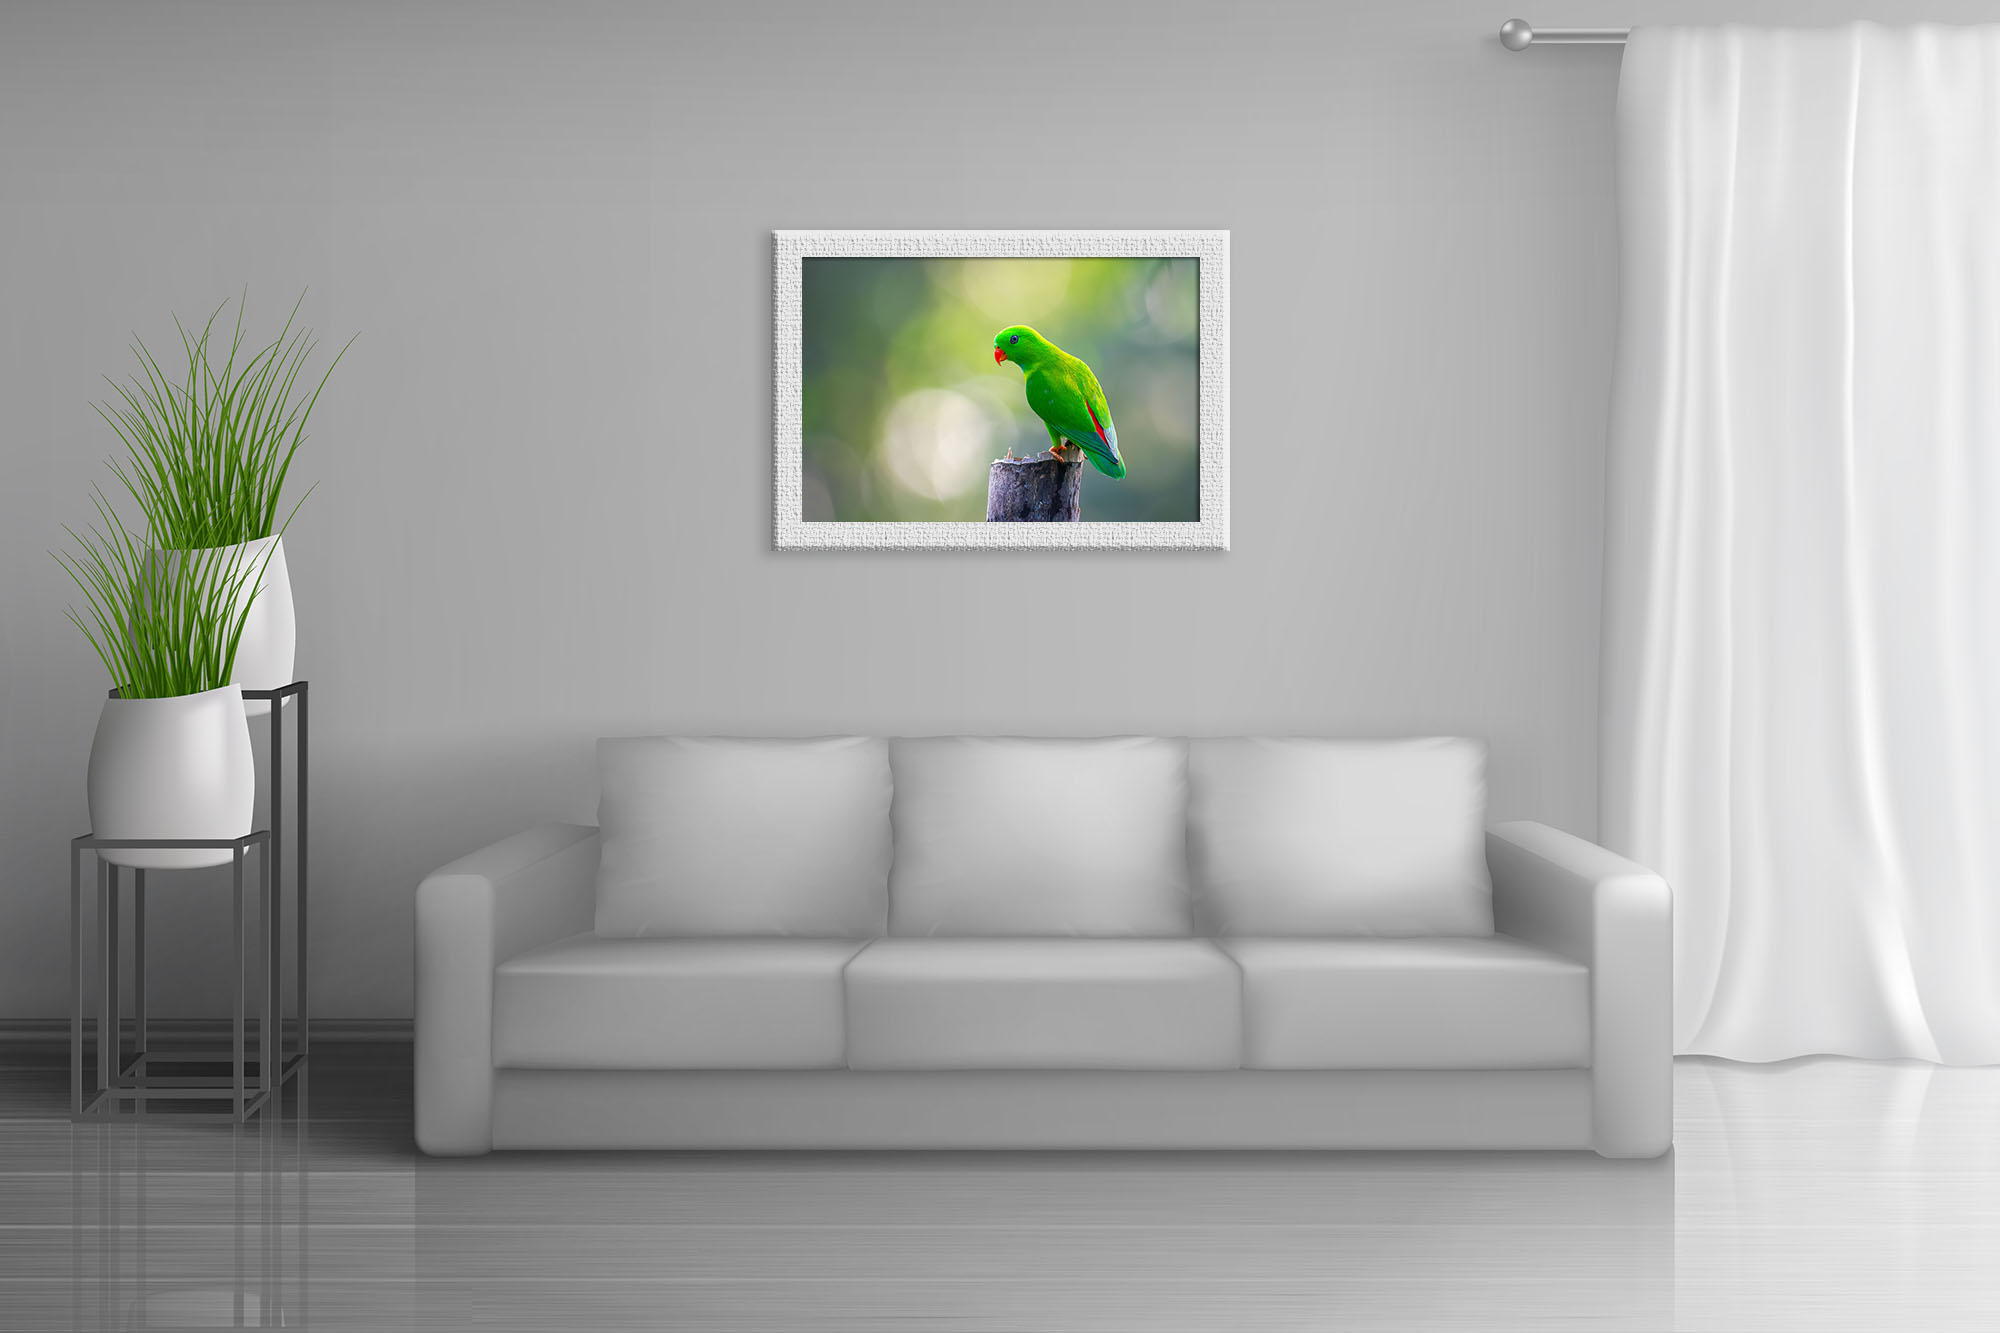 Vernal hanging parrot by Suvradeep Mitra